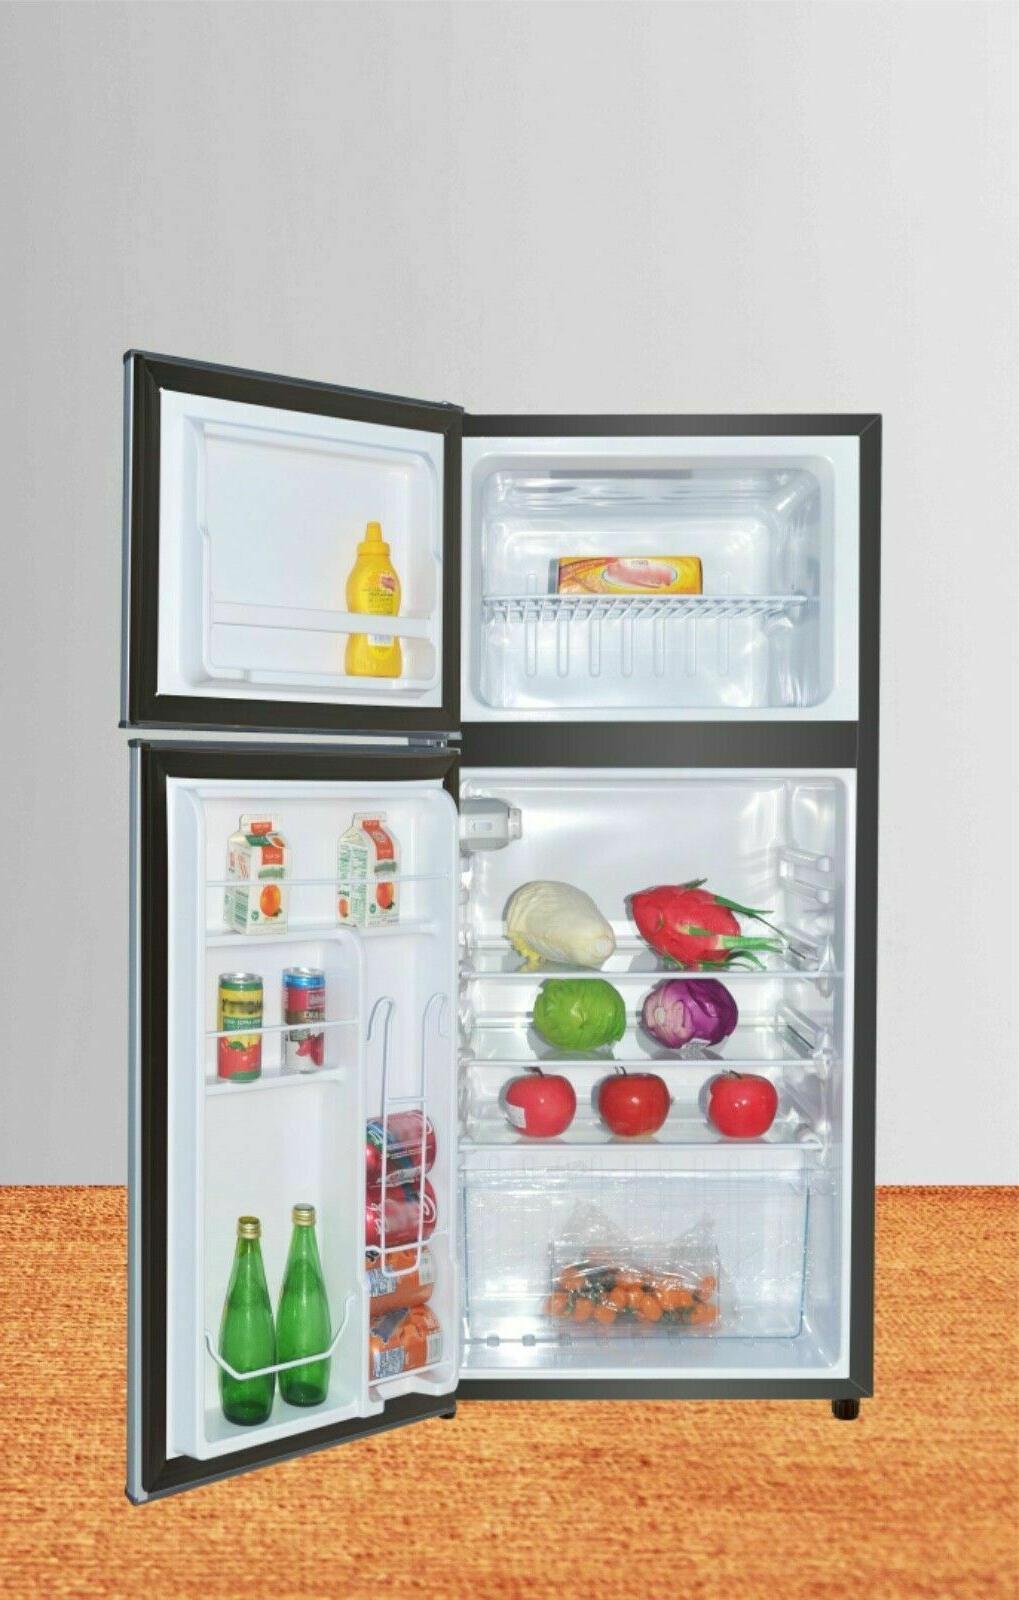 RCA Two Mini With Freezer